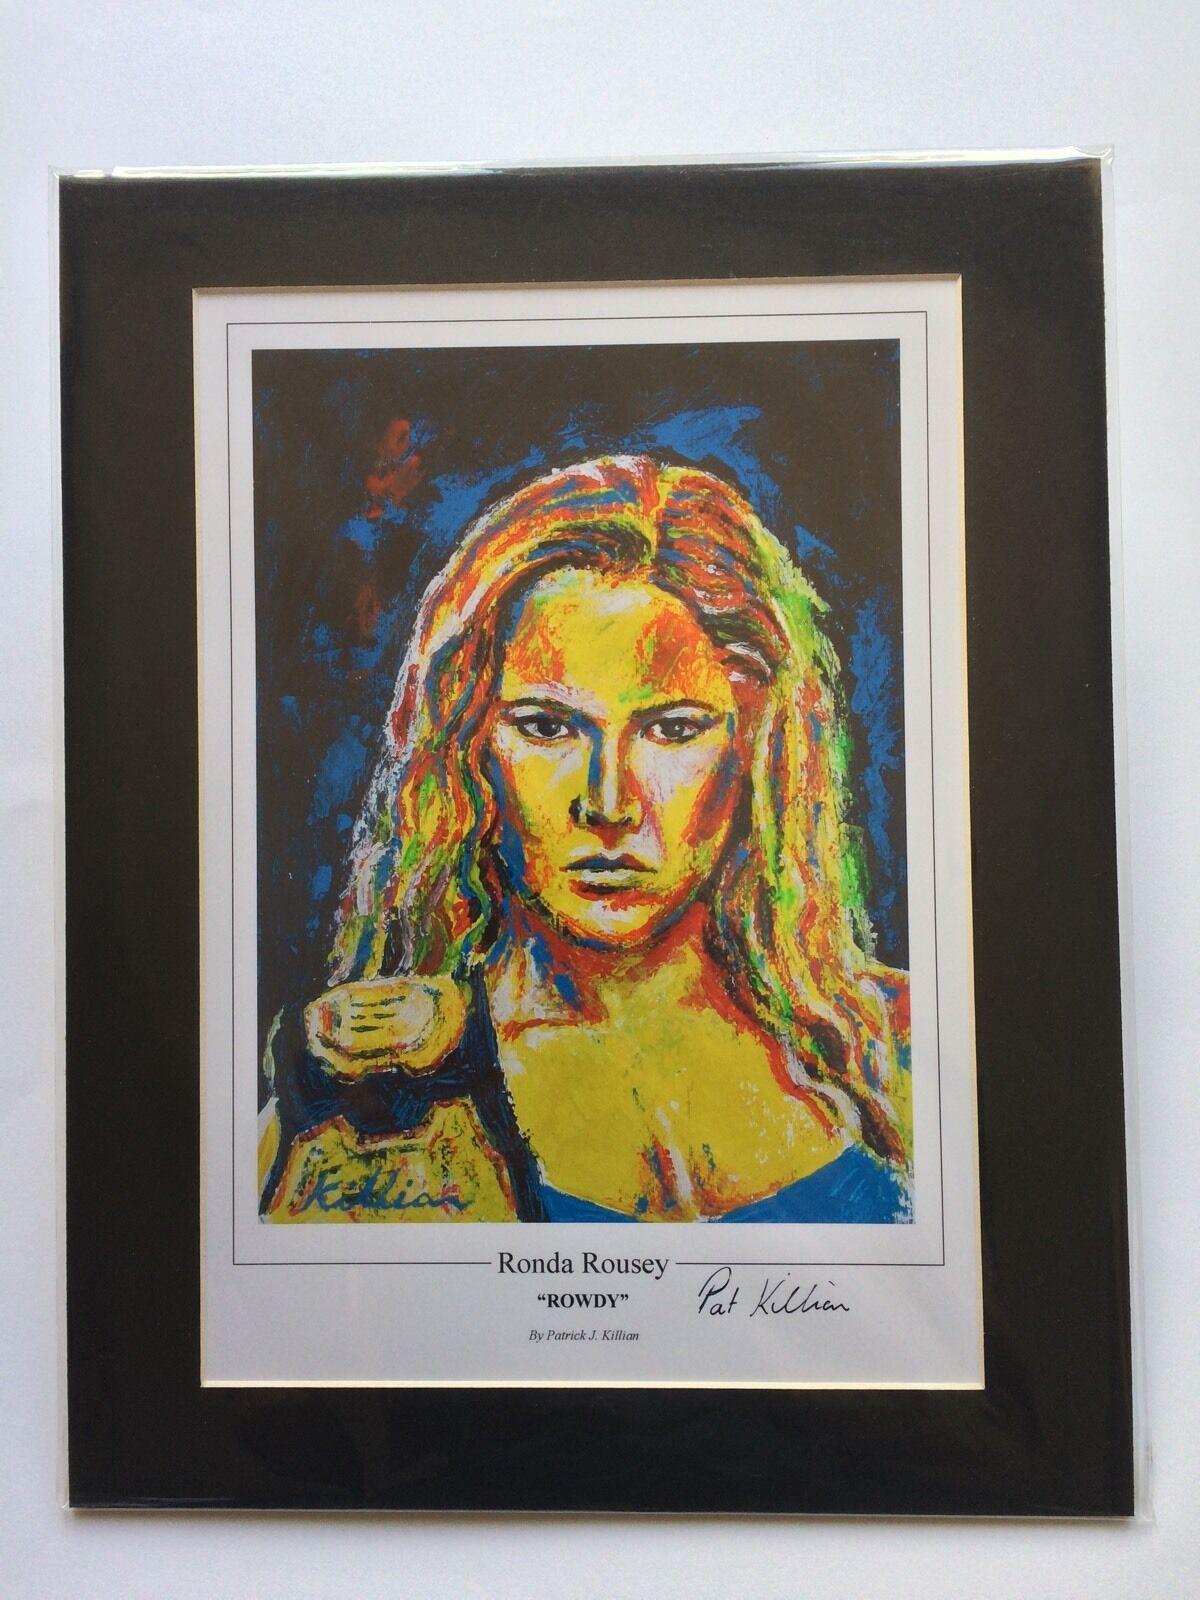 Ronda Rousey Contemporary Art Print por Patrick J. de Killian